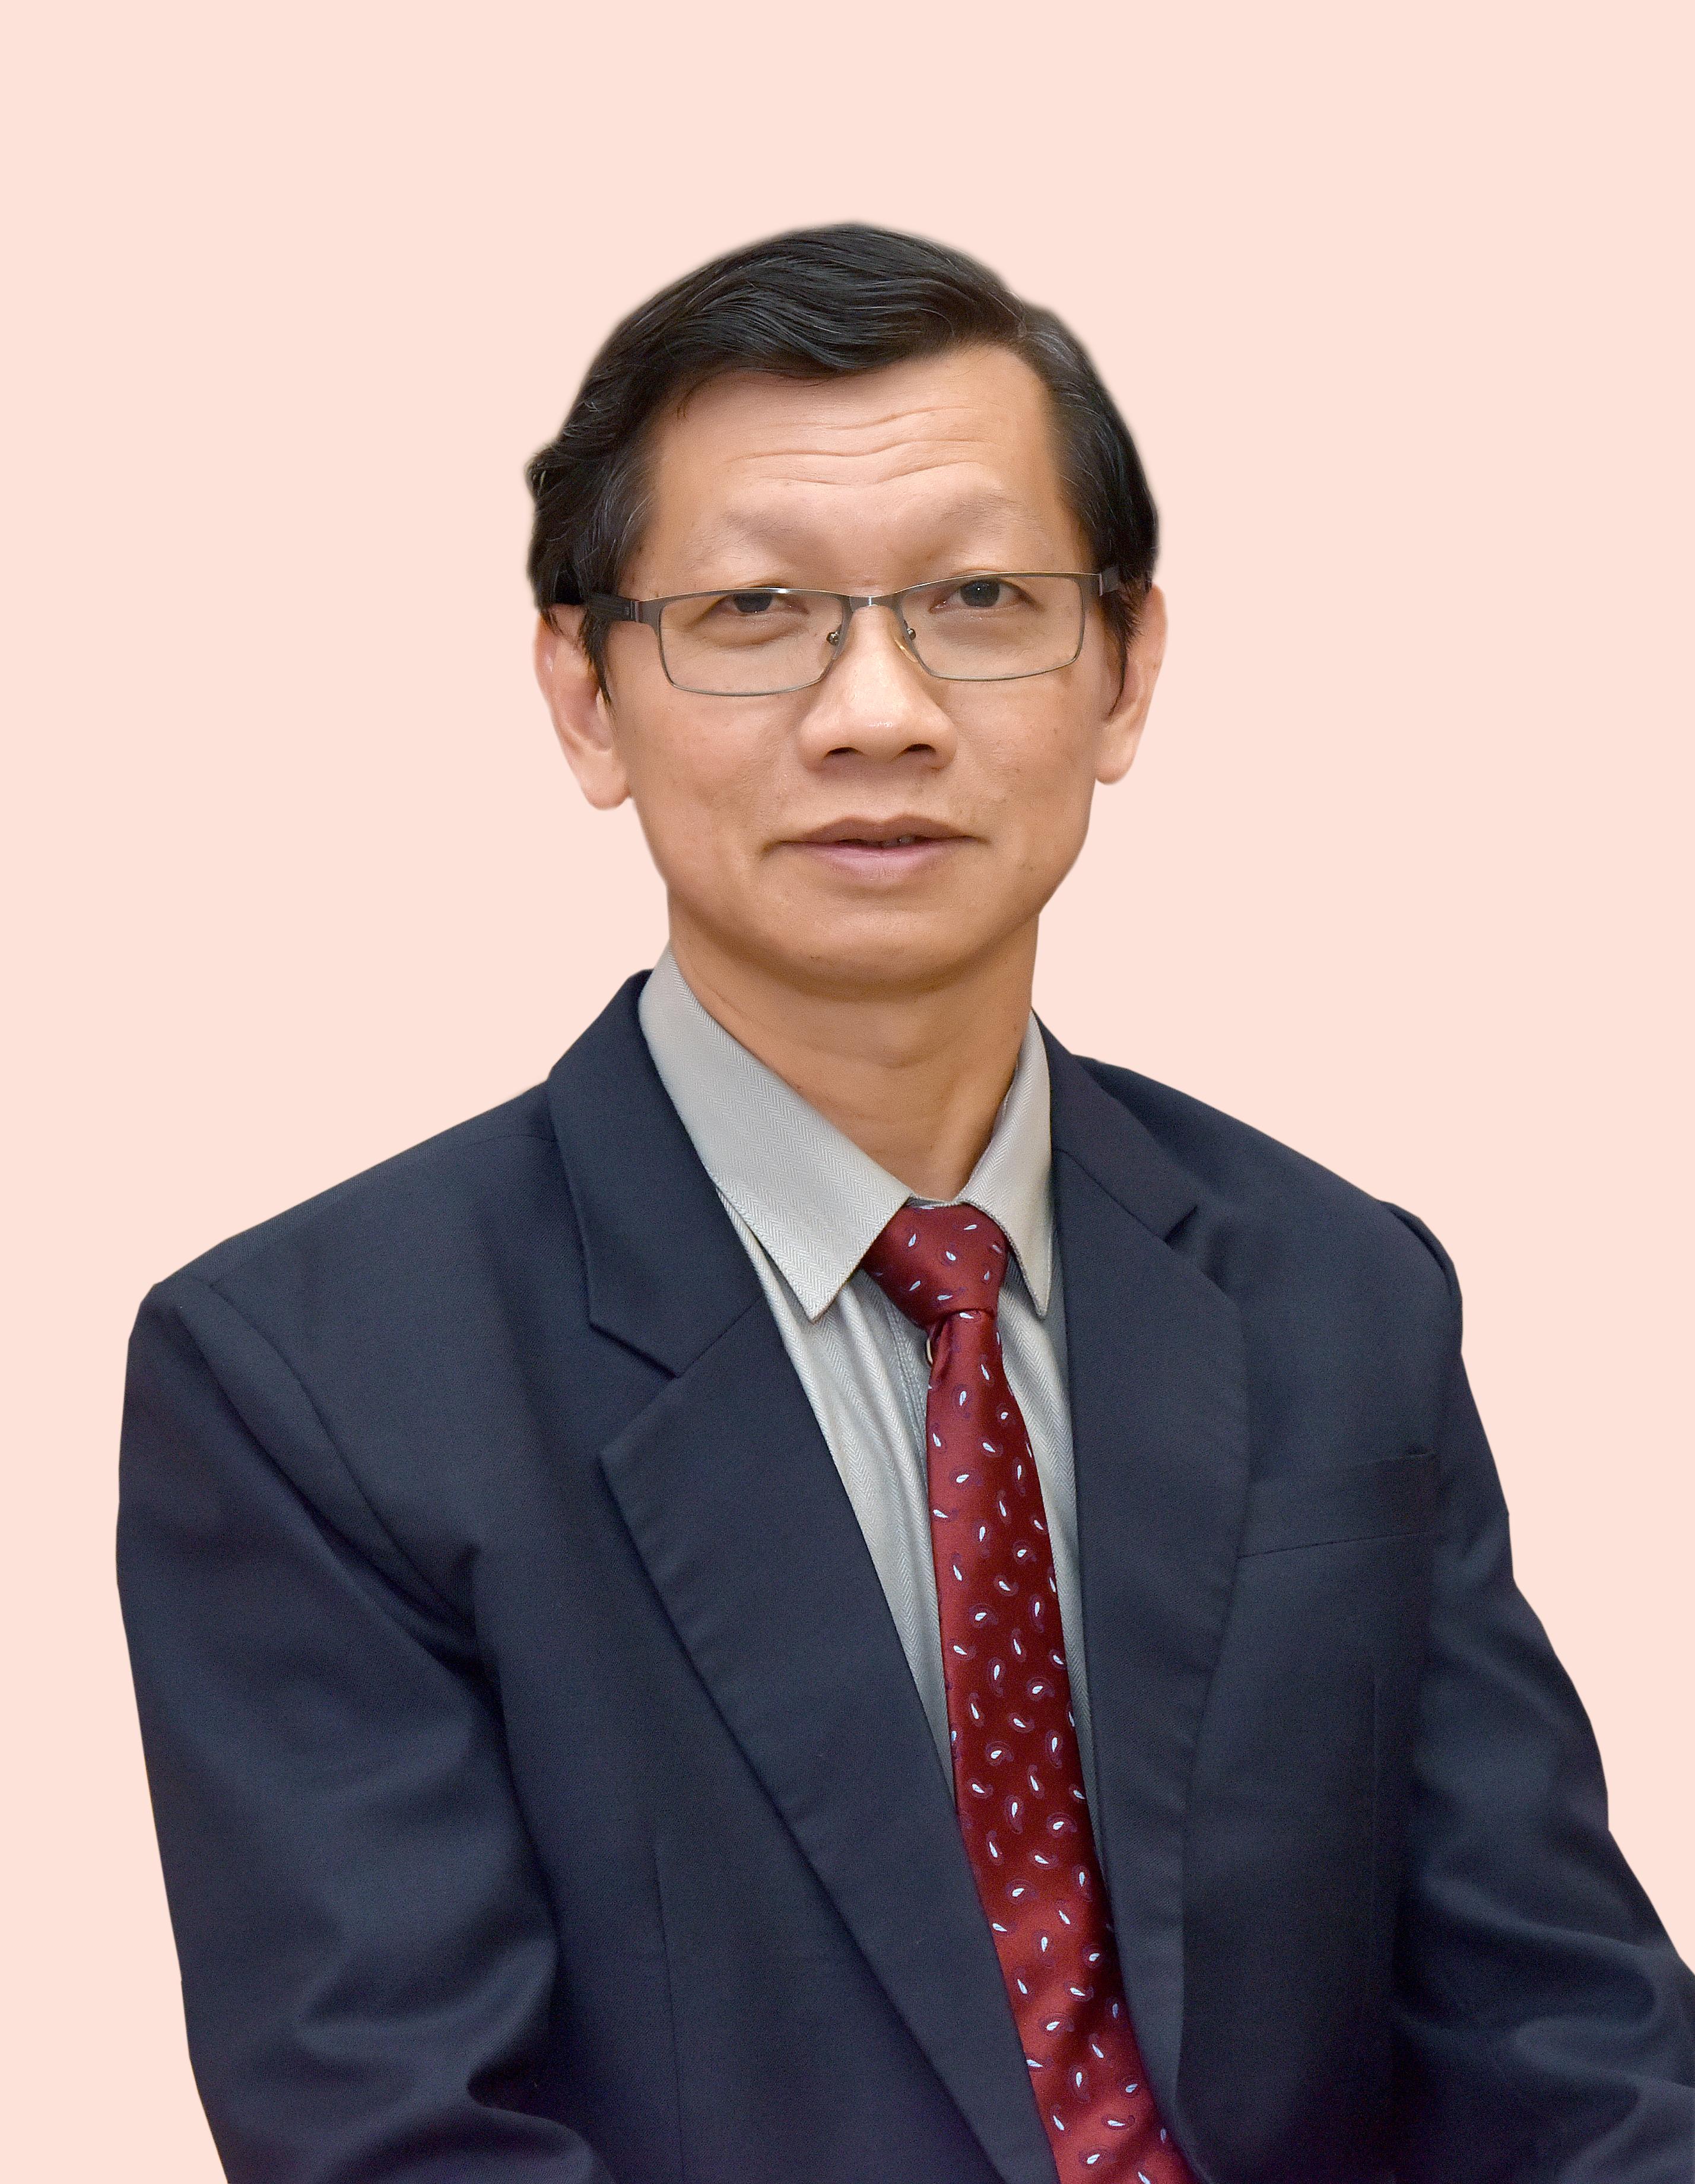 <h80>彭刚浚</h80><br>Pang Kong Woon